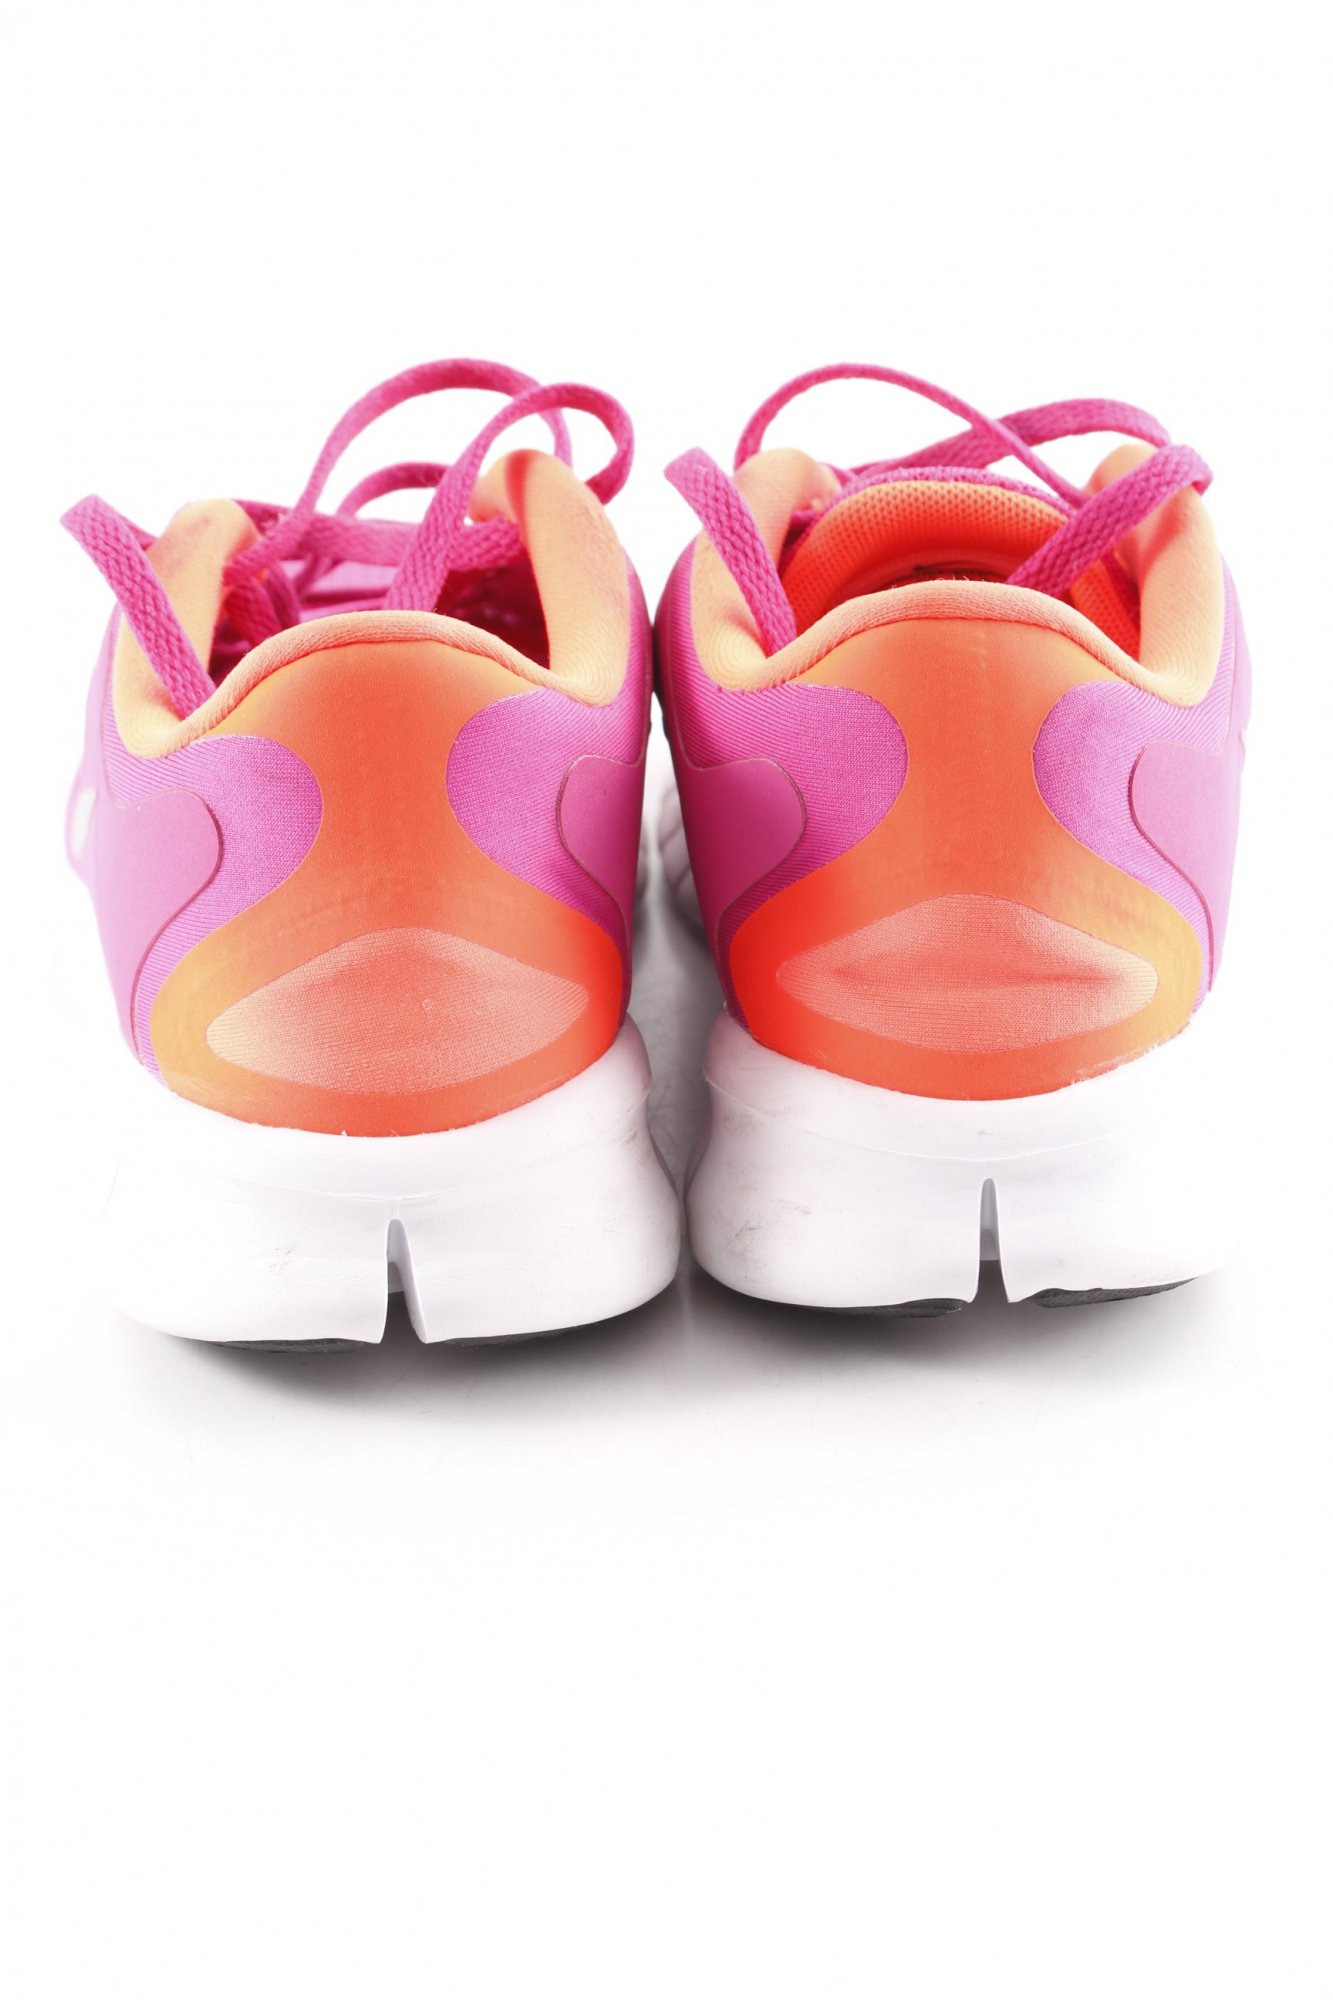 "37 Nike Free Sneakers Damen ""nike 5 Magenta 5 0"" De Schnürsneaker Gr Sneaker w18wq4ng6"